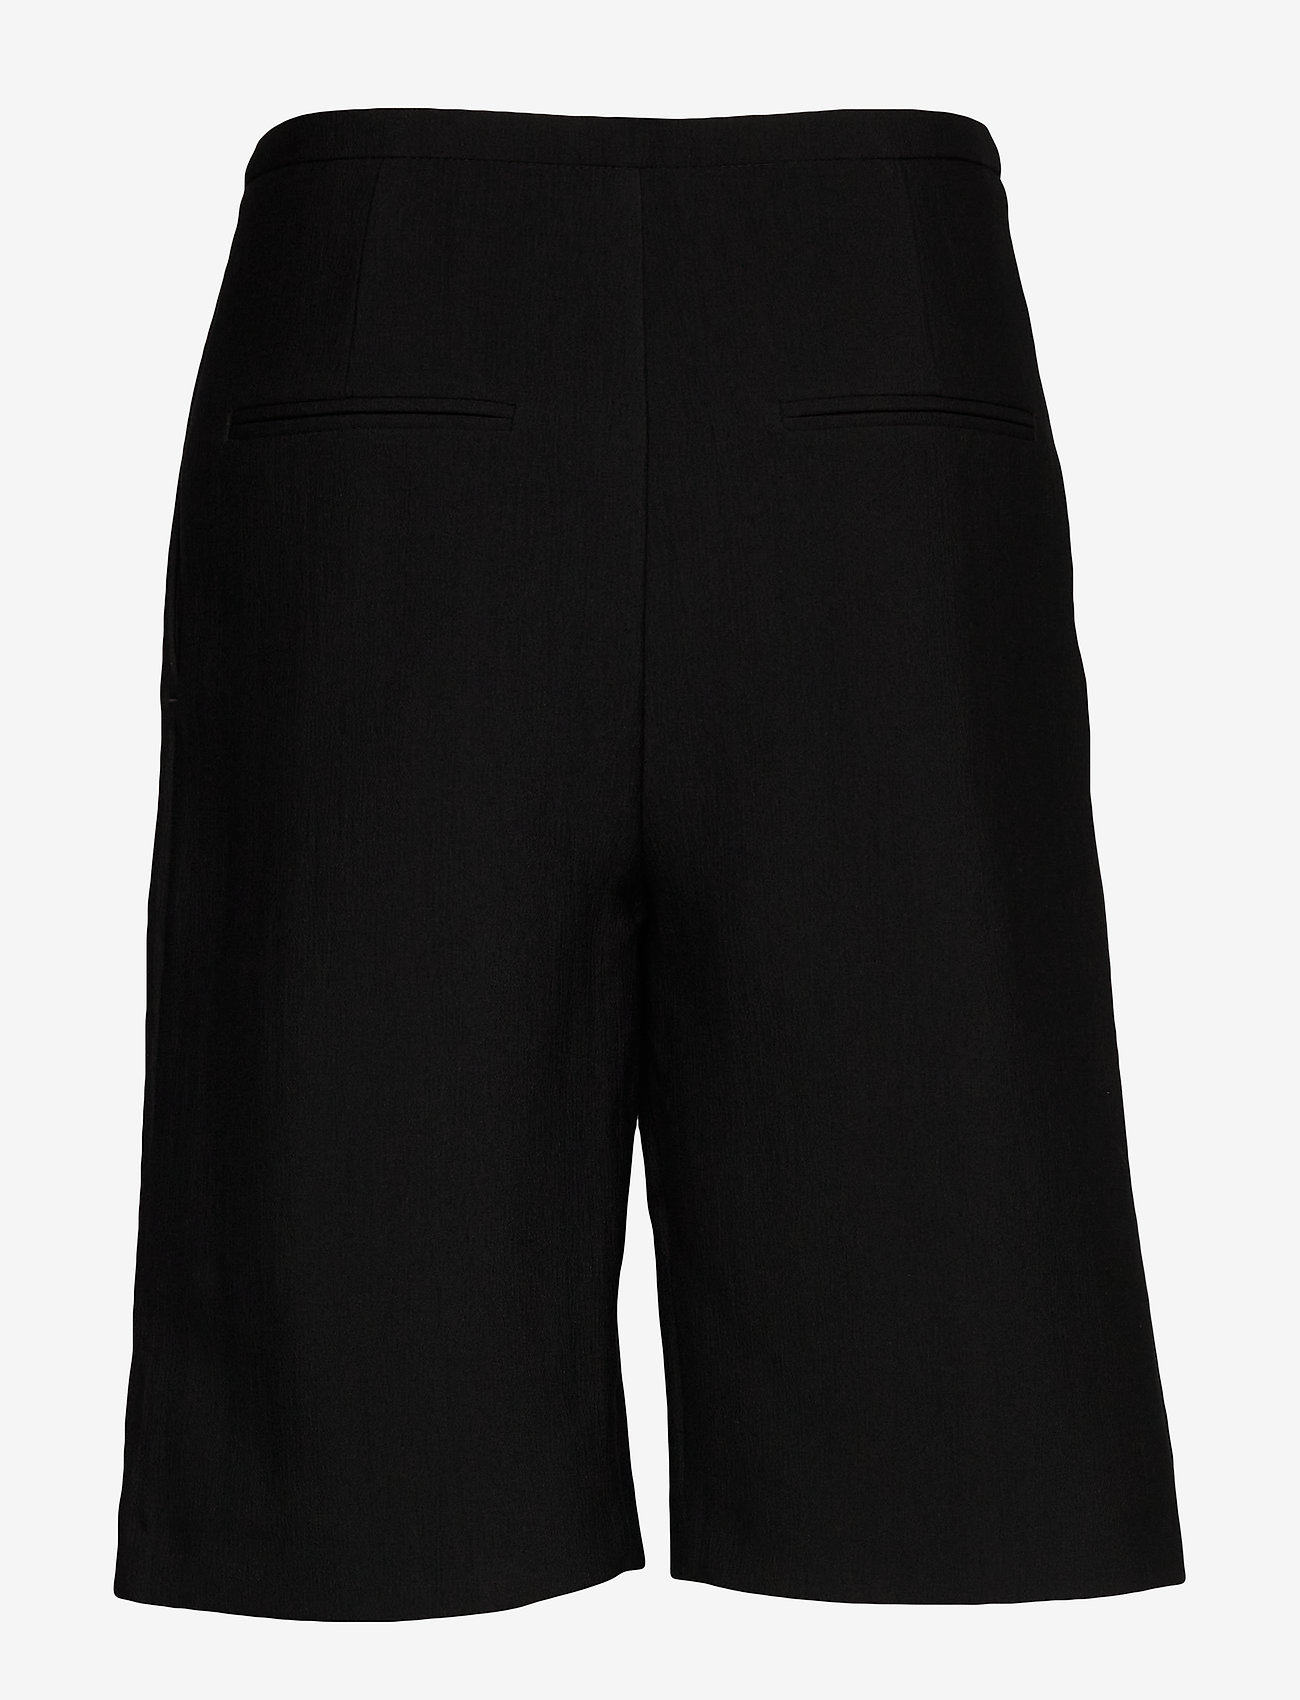 Totême - LLUC - bermudy - black 200 - 1